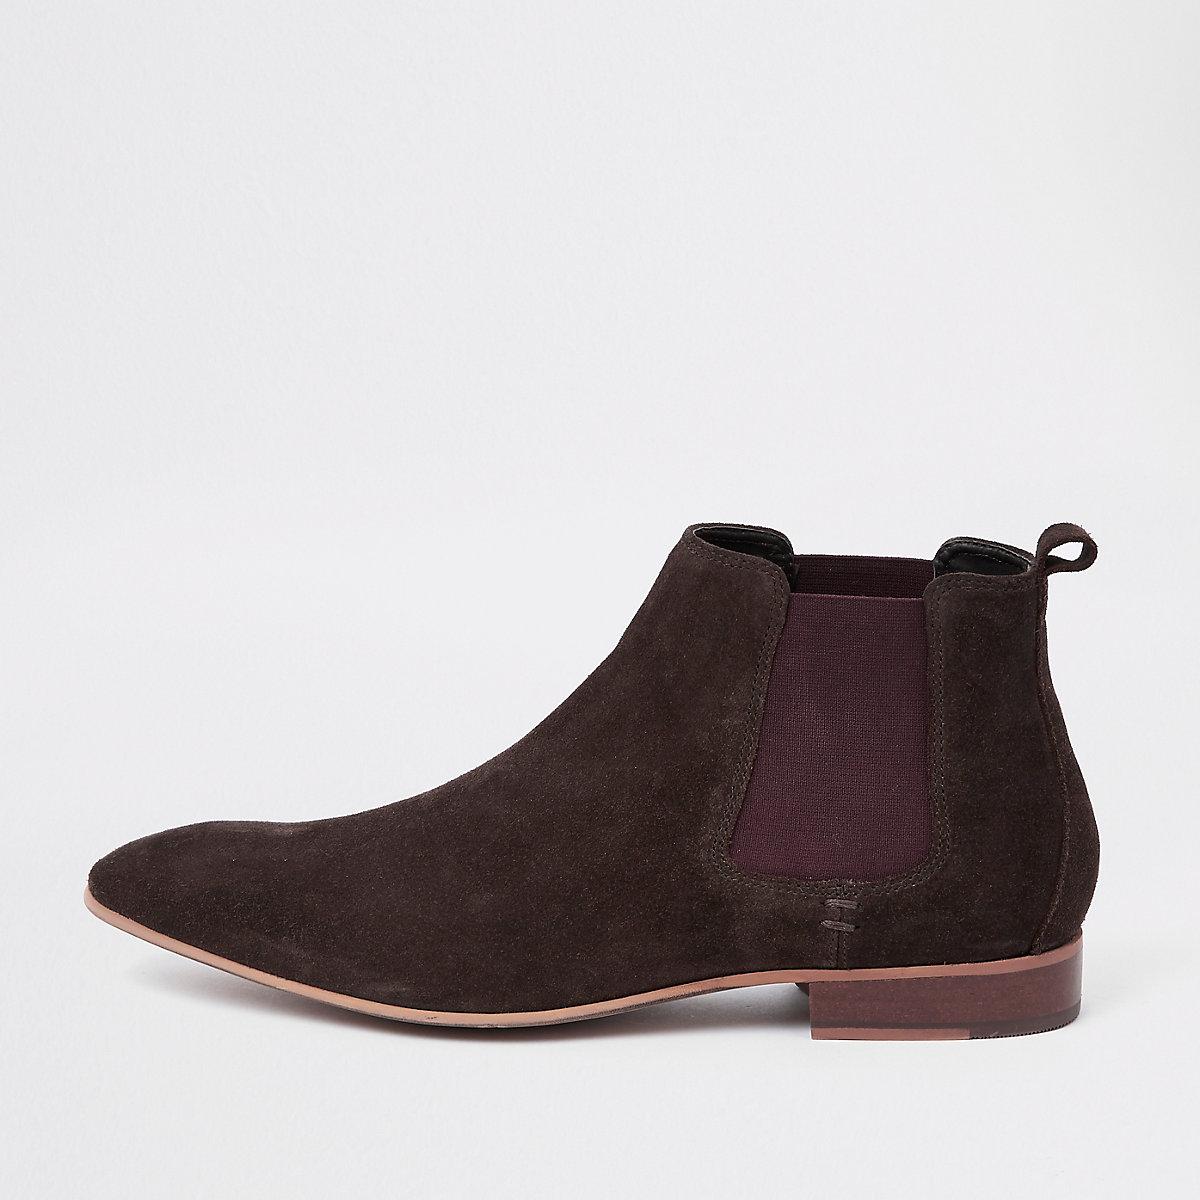 Dark brown suede chelsea boots